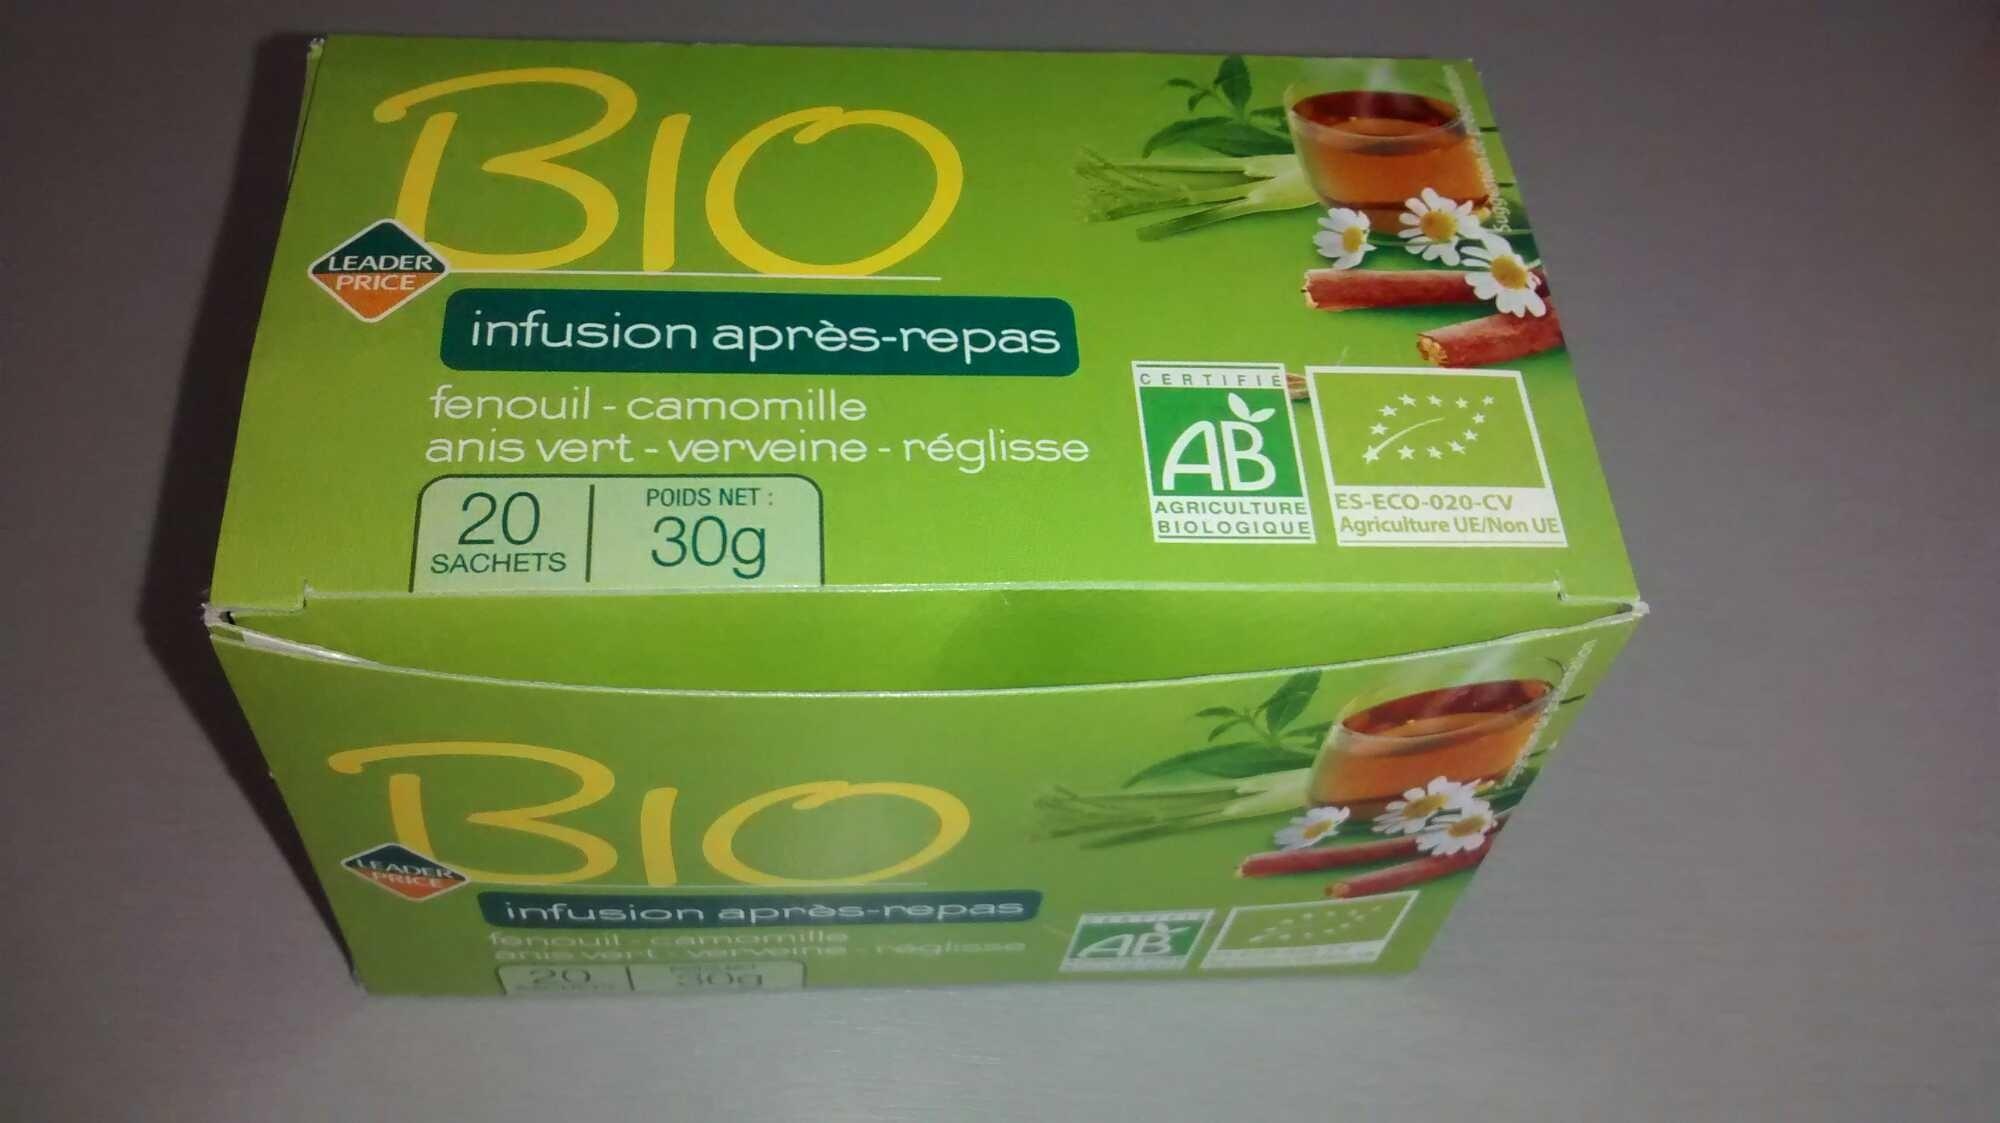 Infusion après repas BIO - Leader Price - Product - fr